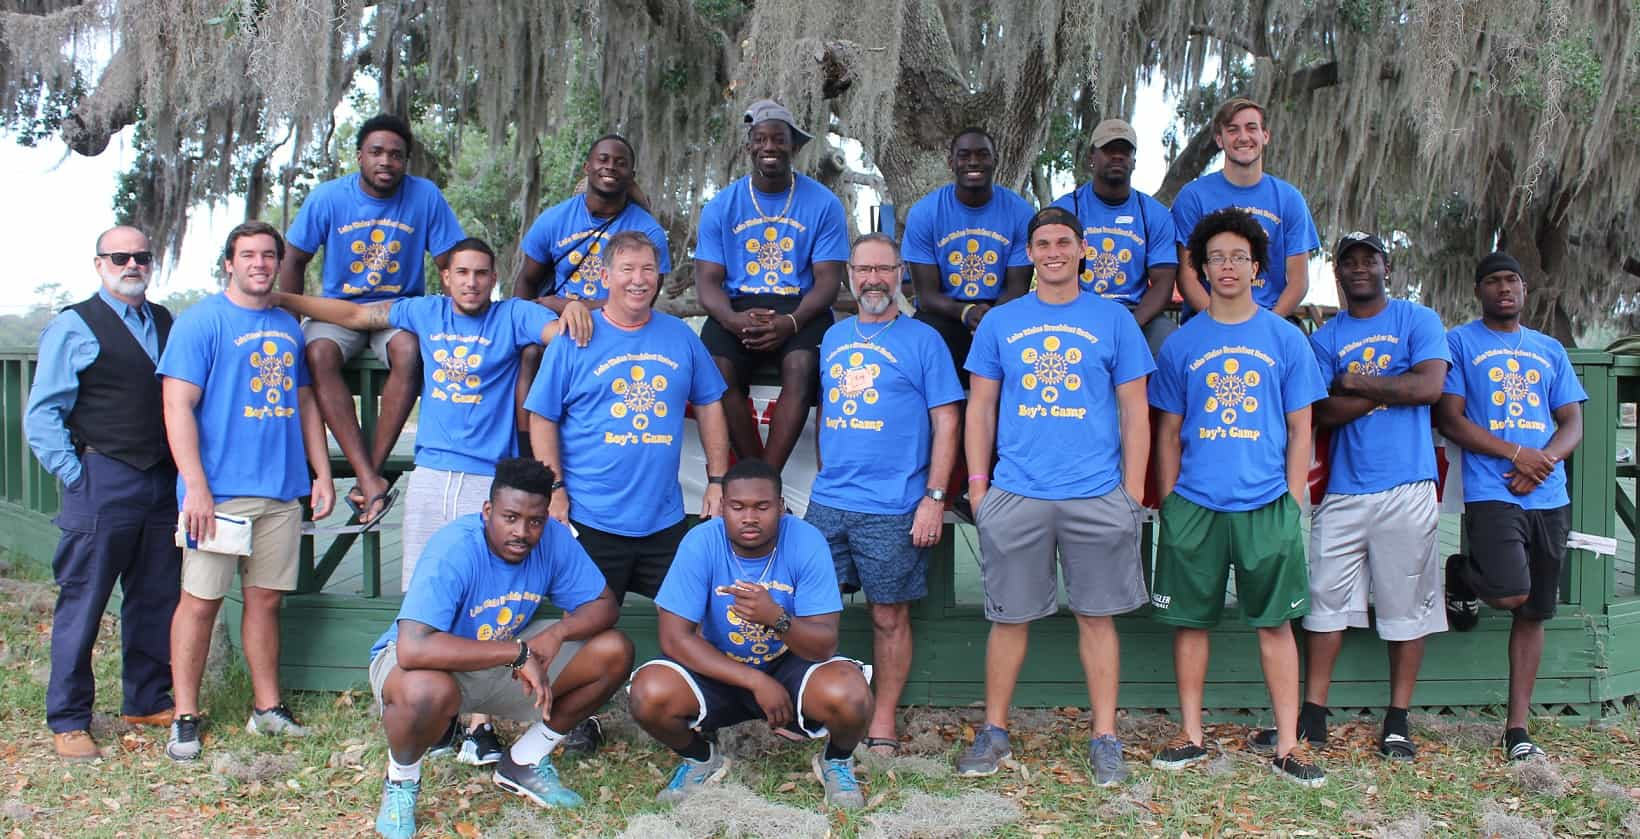 Football Players Volunteer at Camp